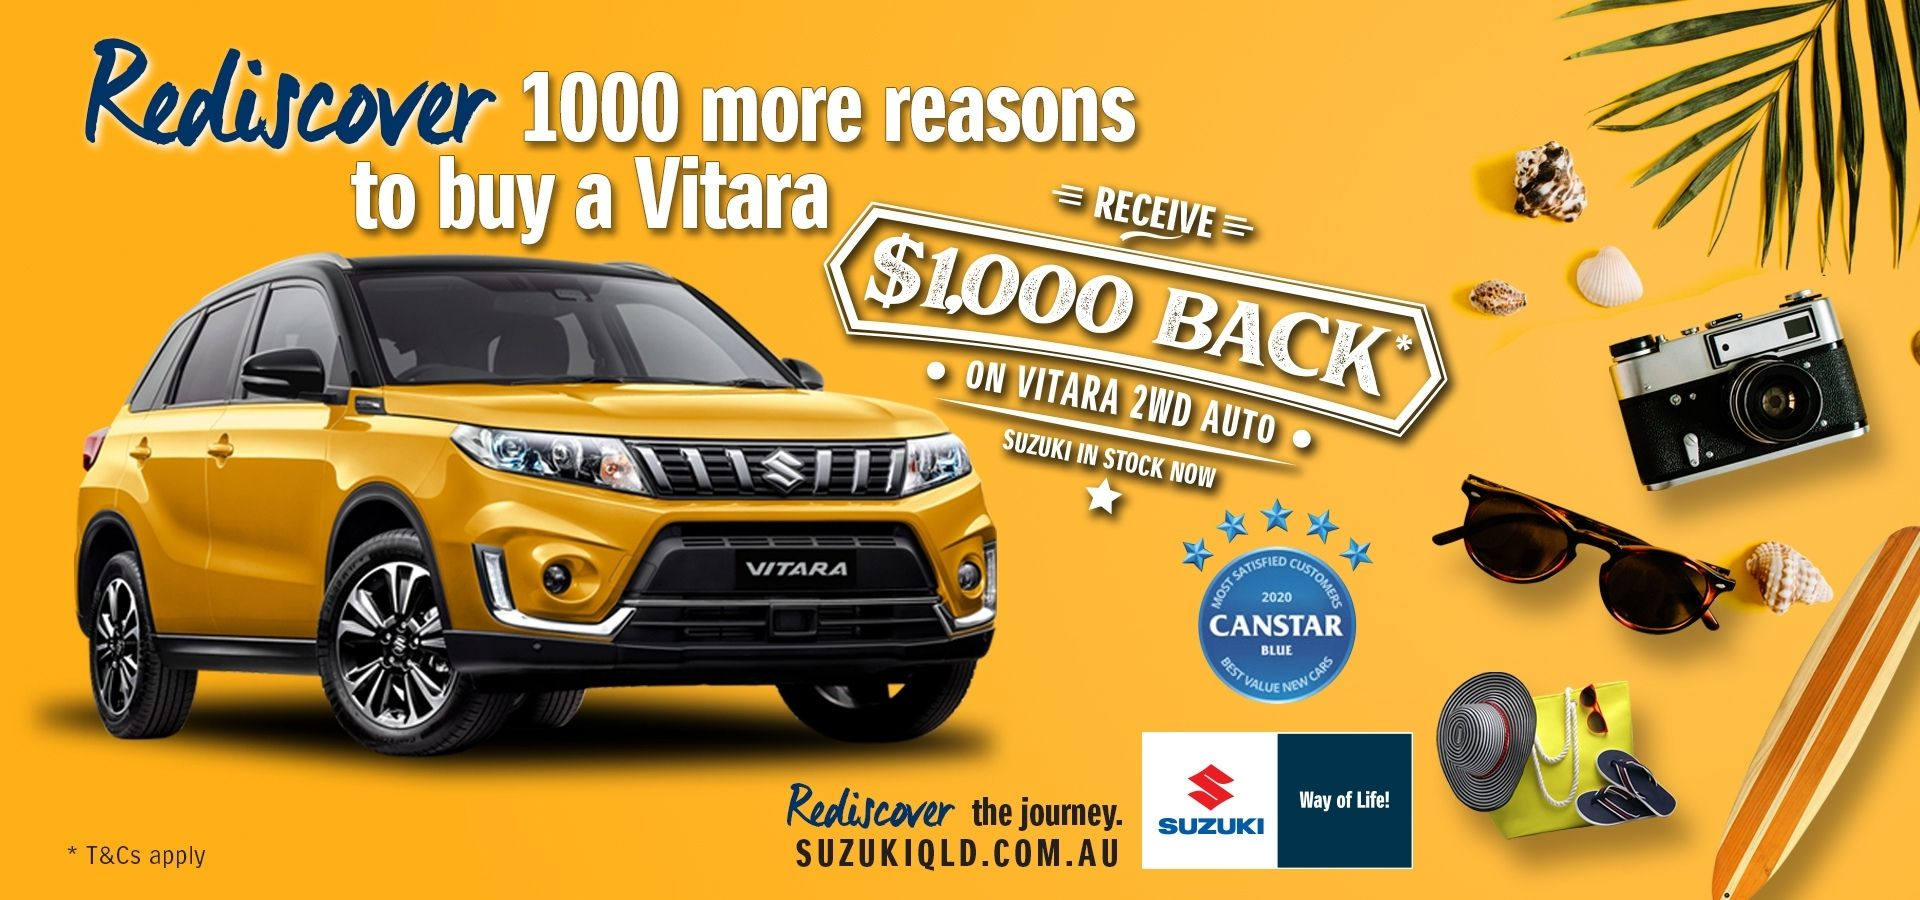 Receive $1,000 back on Vitara 2WD Auto